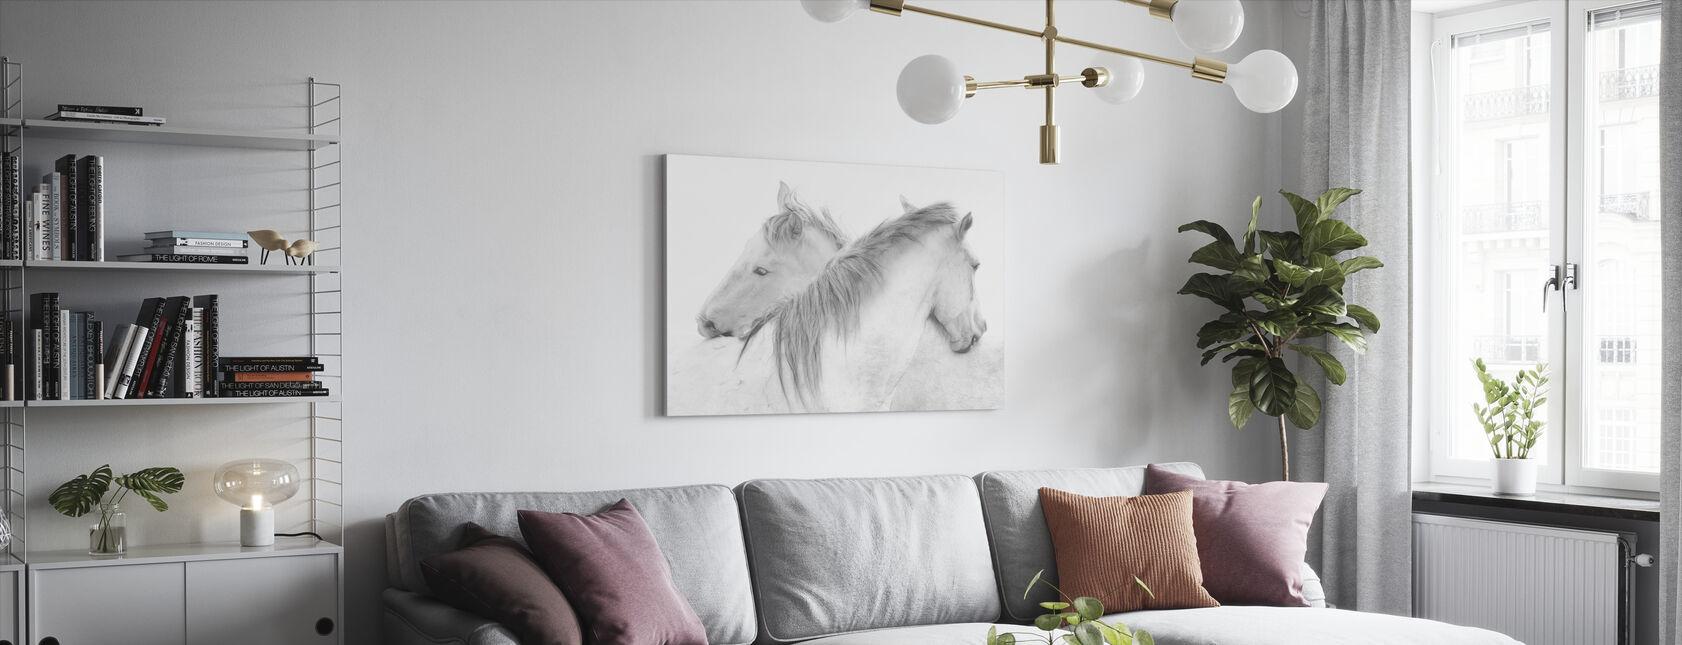 Hevoset - Canvastaulu - Olohuone